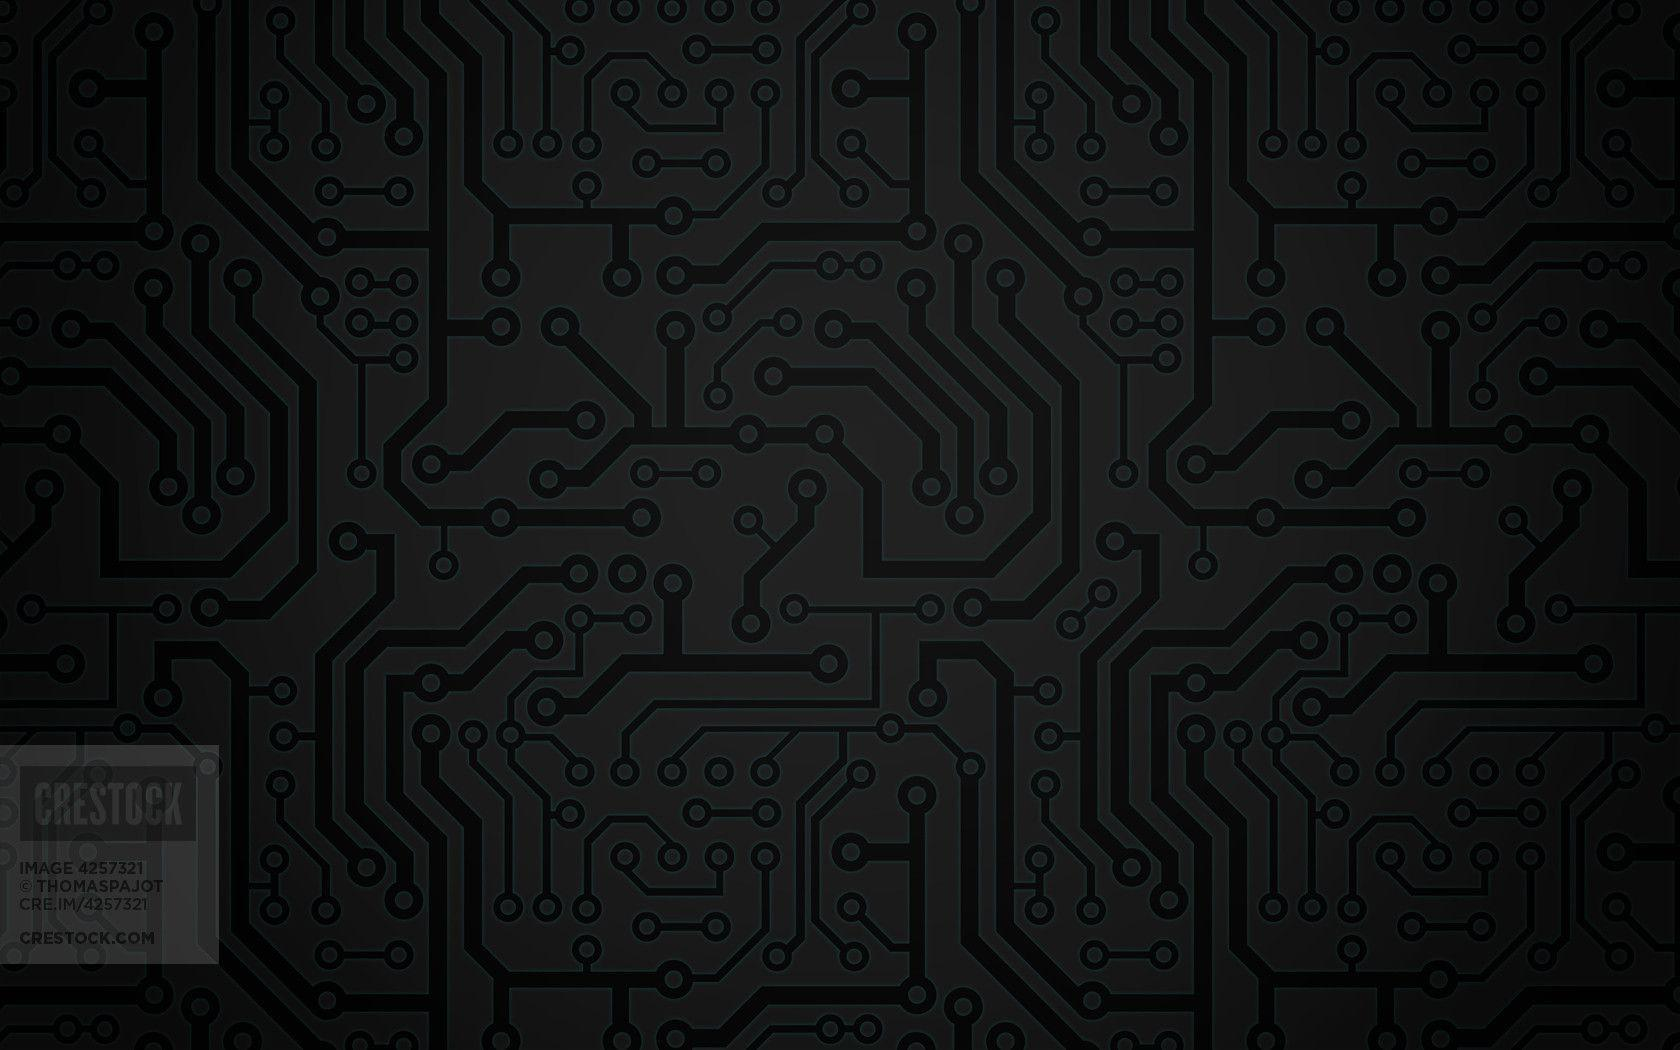 black circuit background